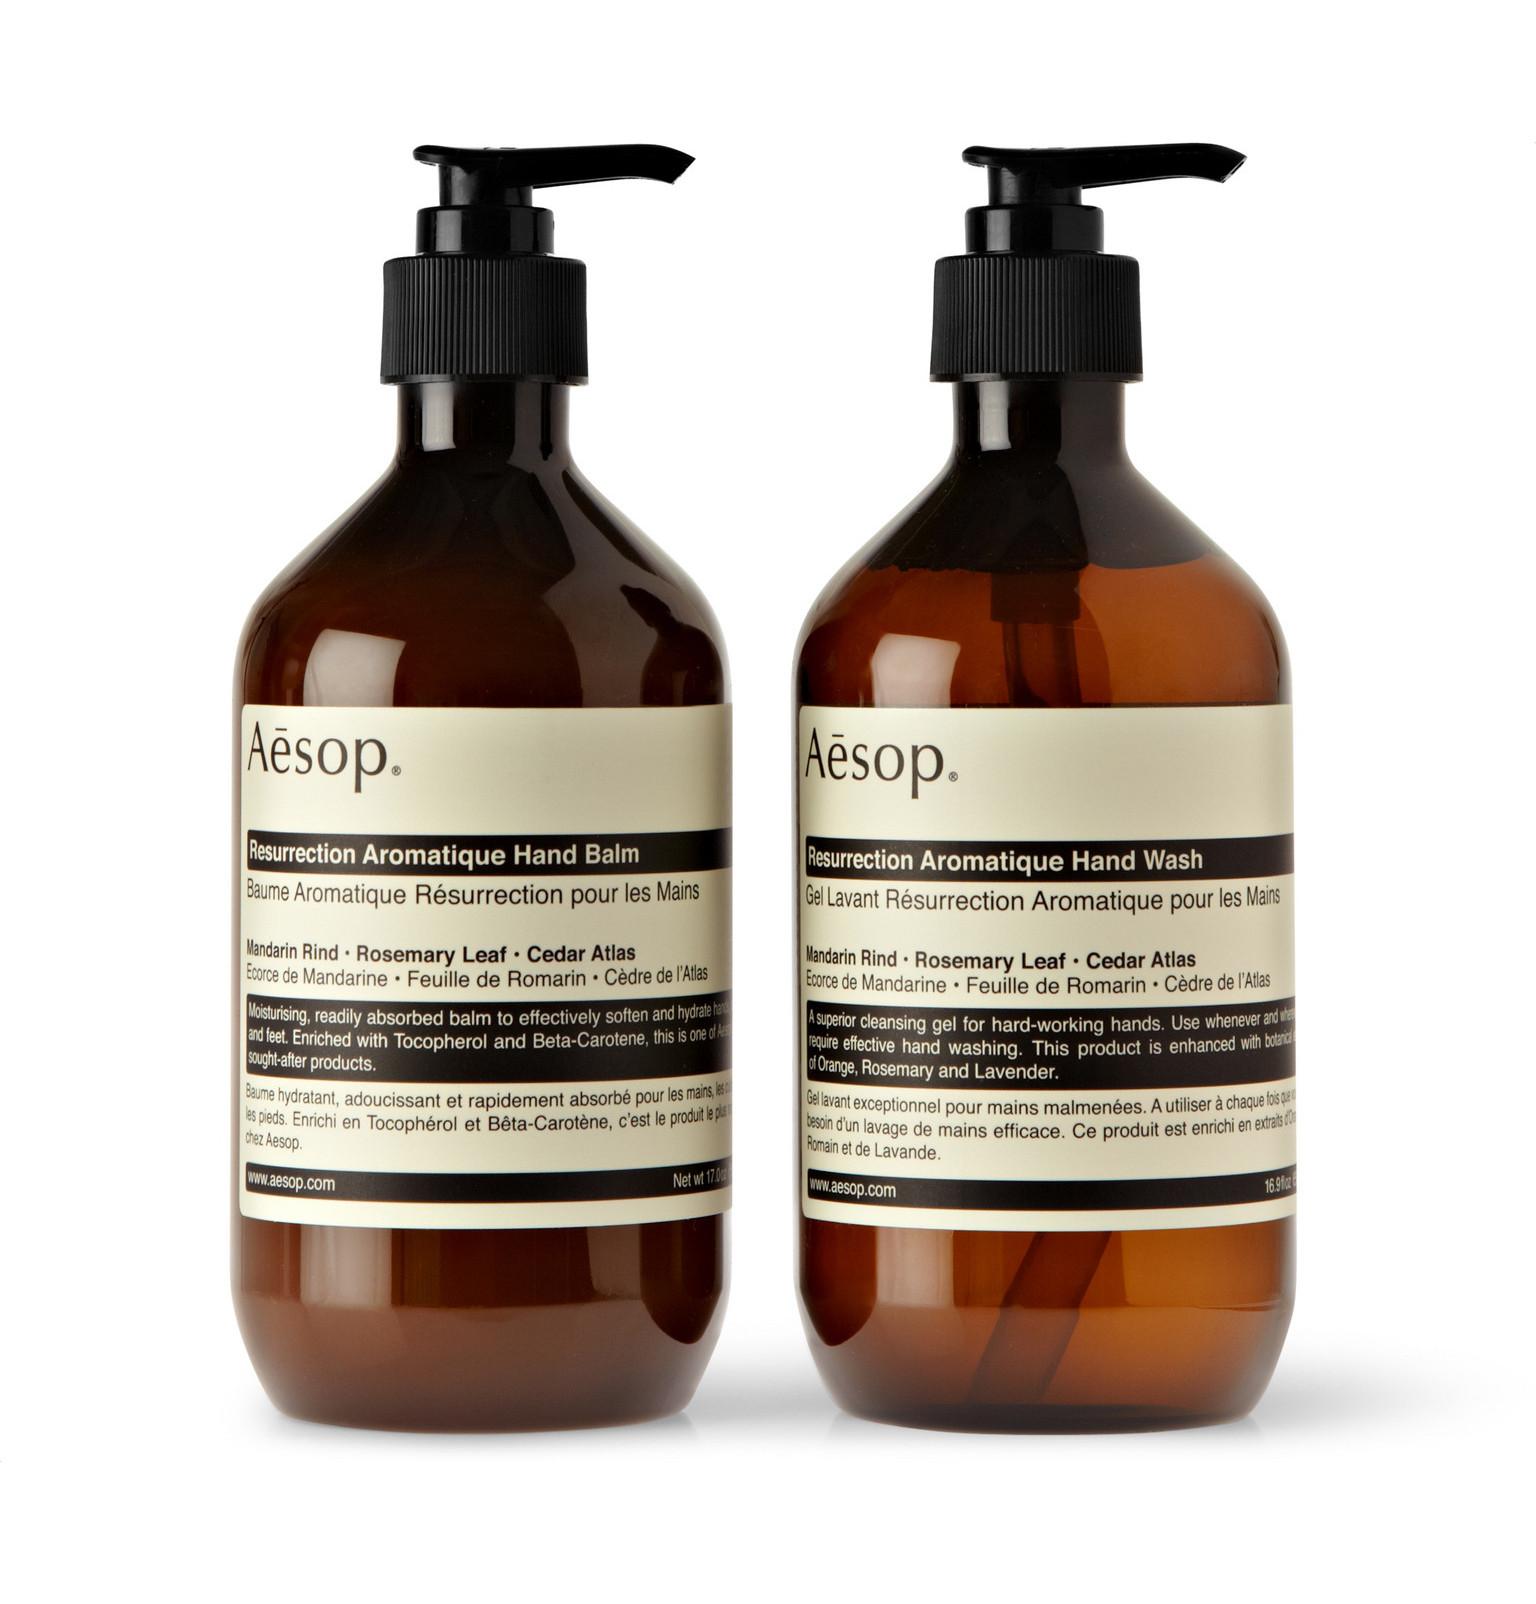 Aesop Soaps | Aesop Hand Soap | Aesop Resurrection Aromatique Hand Balm